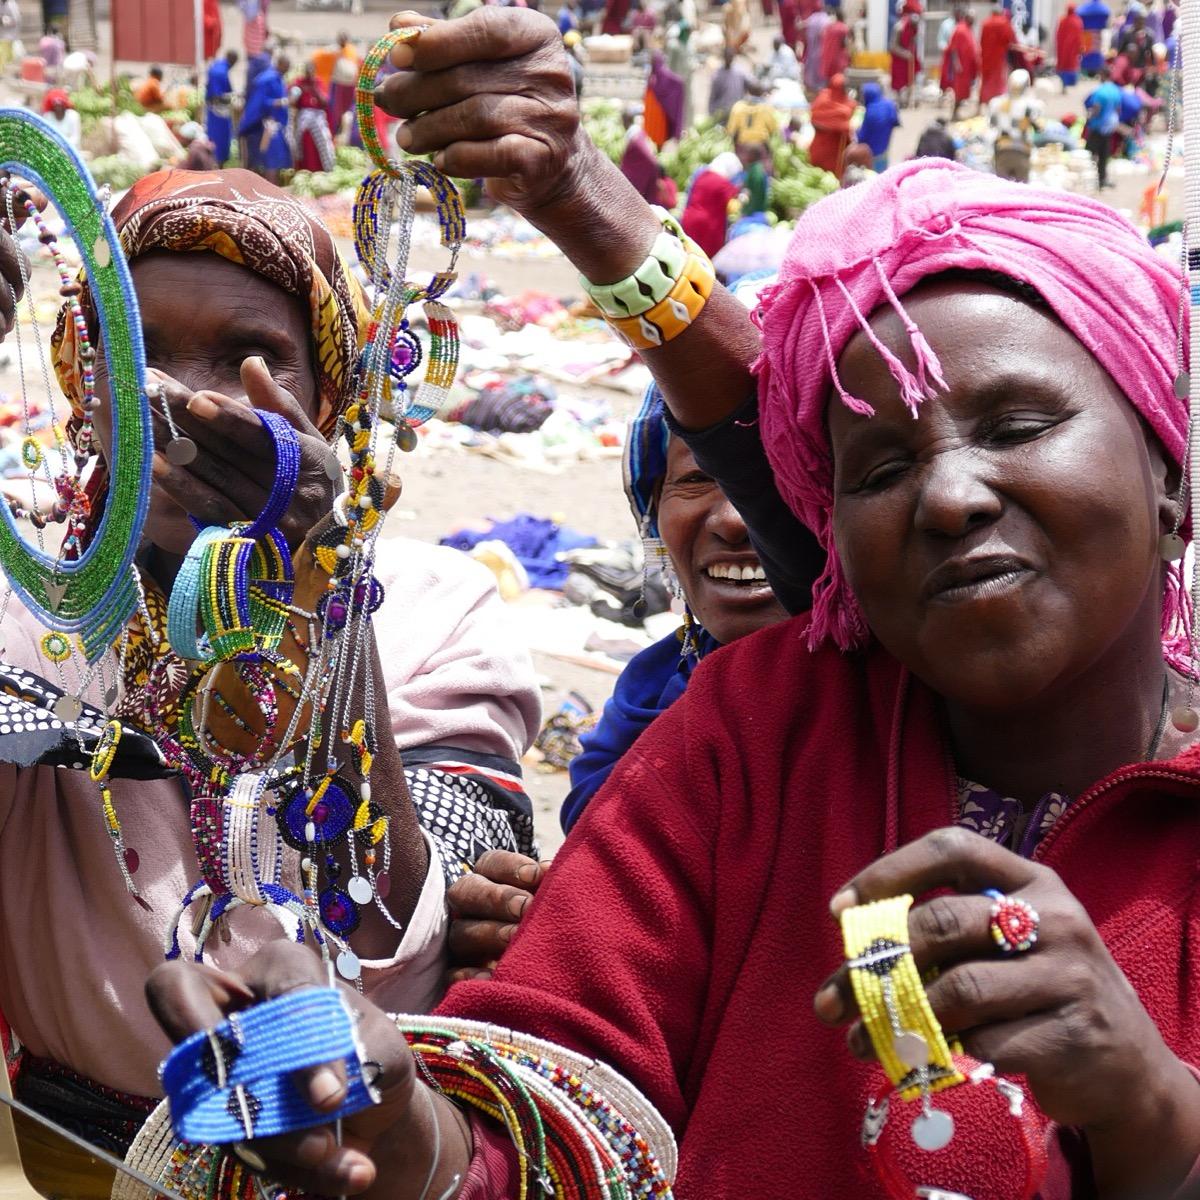 Maasai women gather to sell souvenirs en route to the Serengeti. Noah Strycker